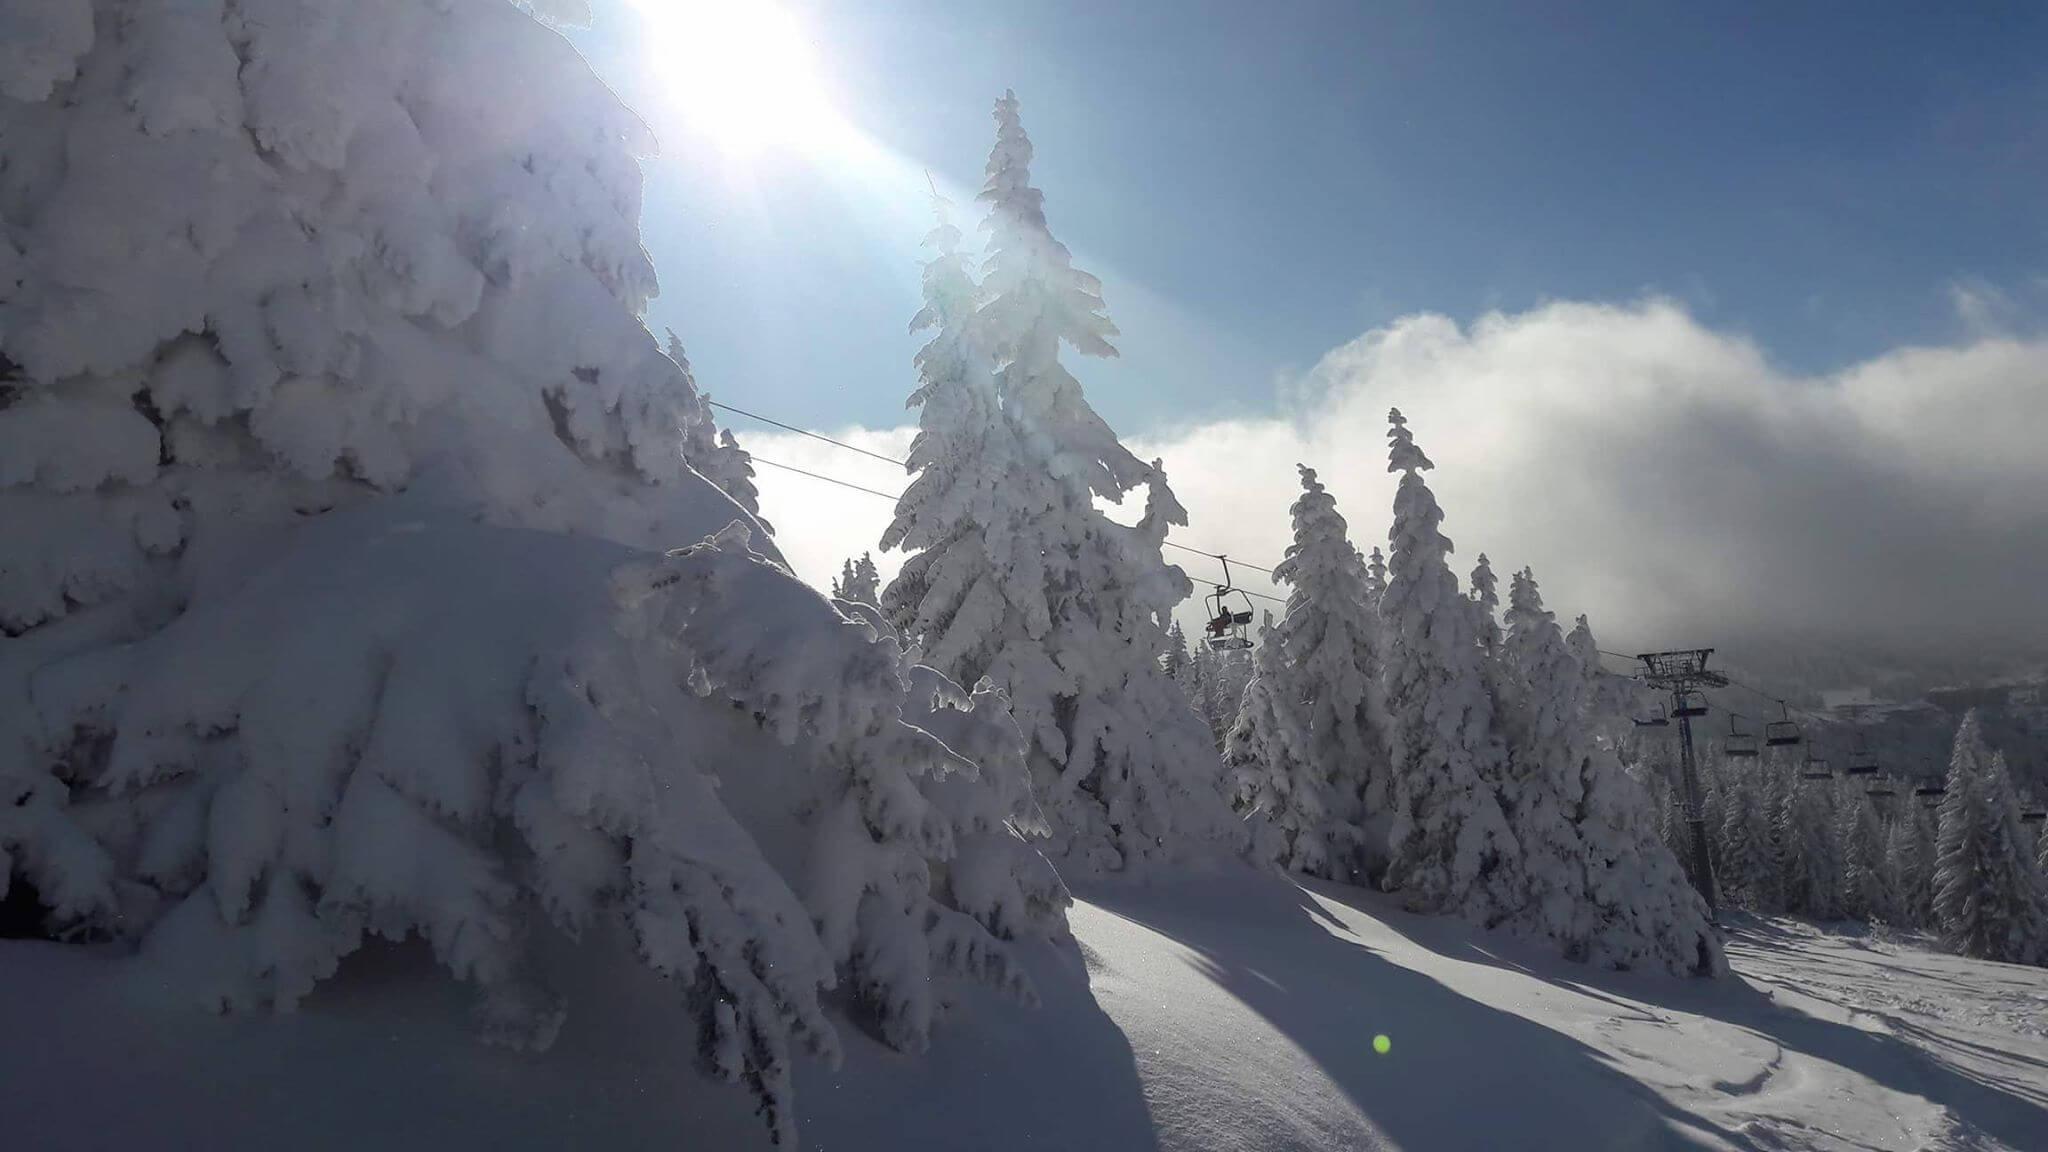 Snežna idila na Kopaoniku (4) - 21. decembar 2017